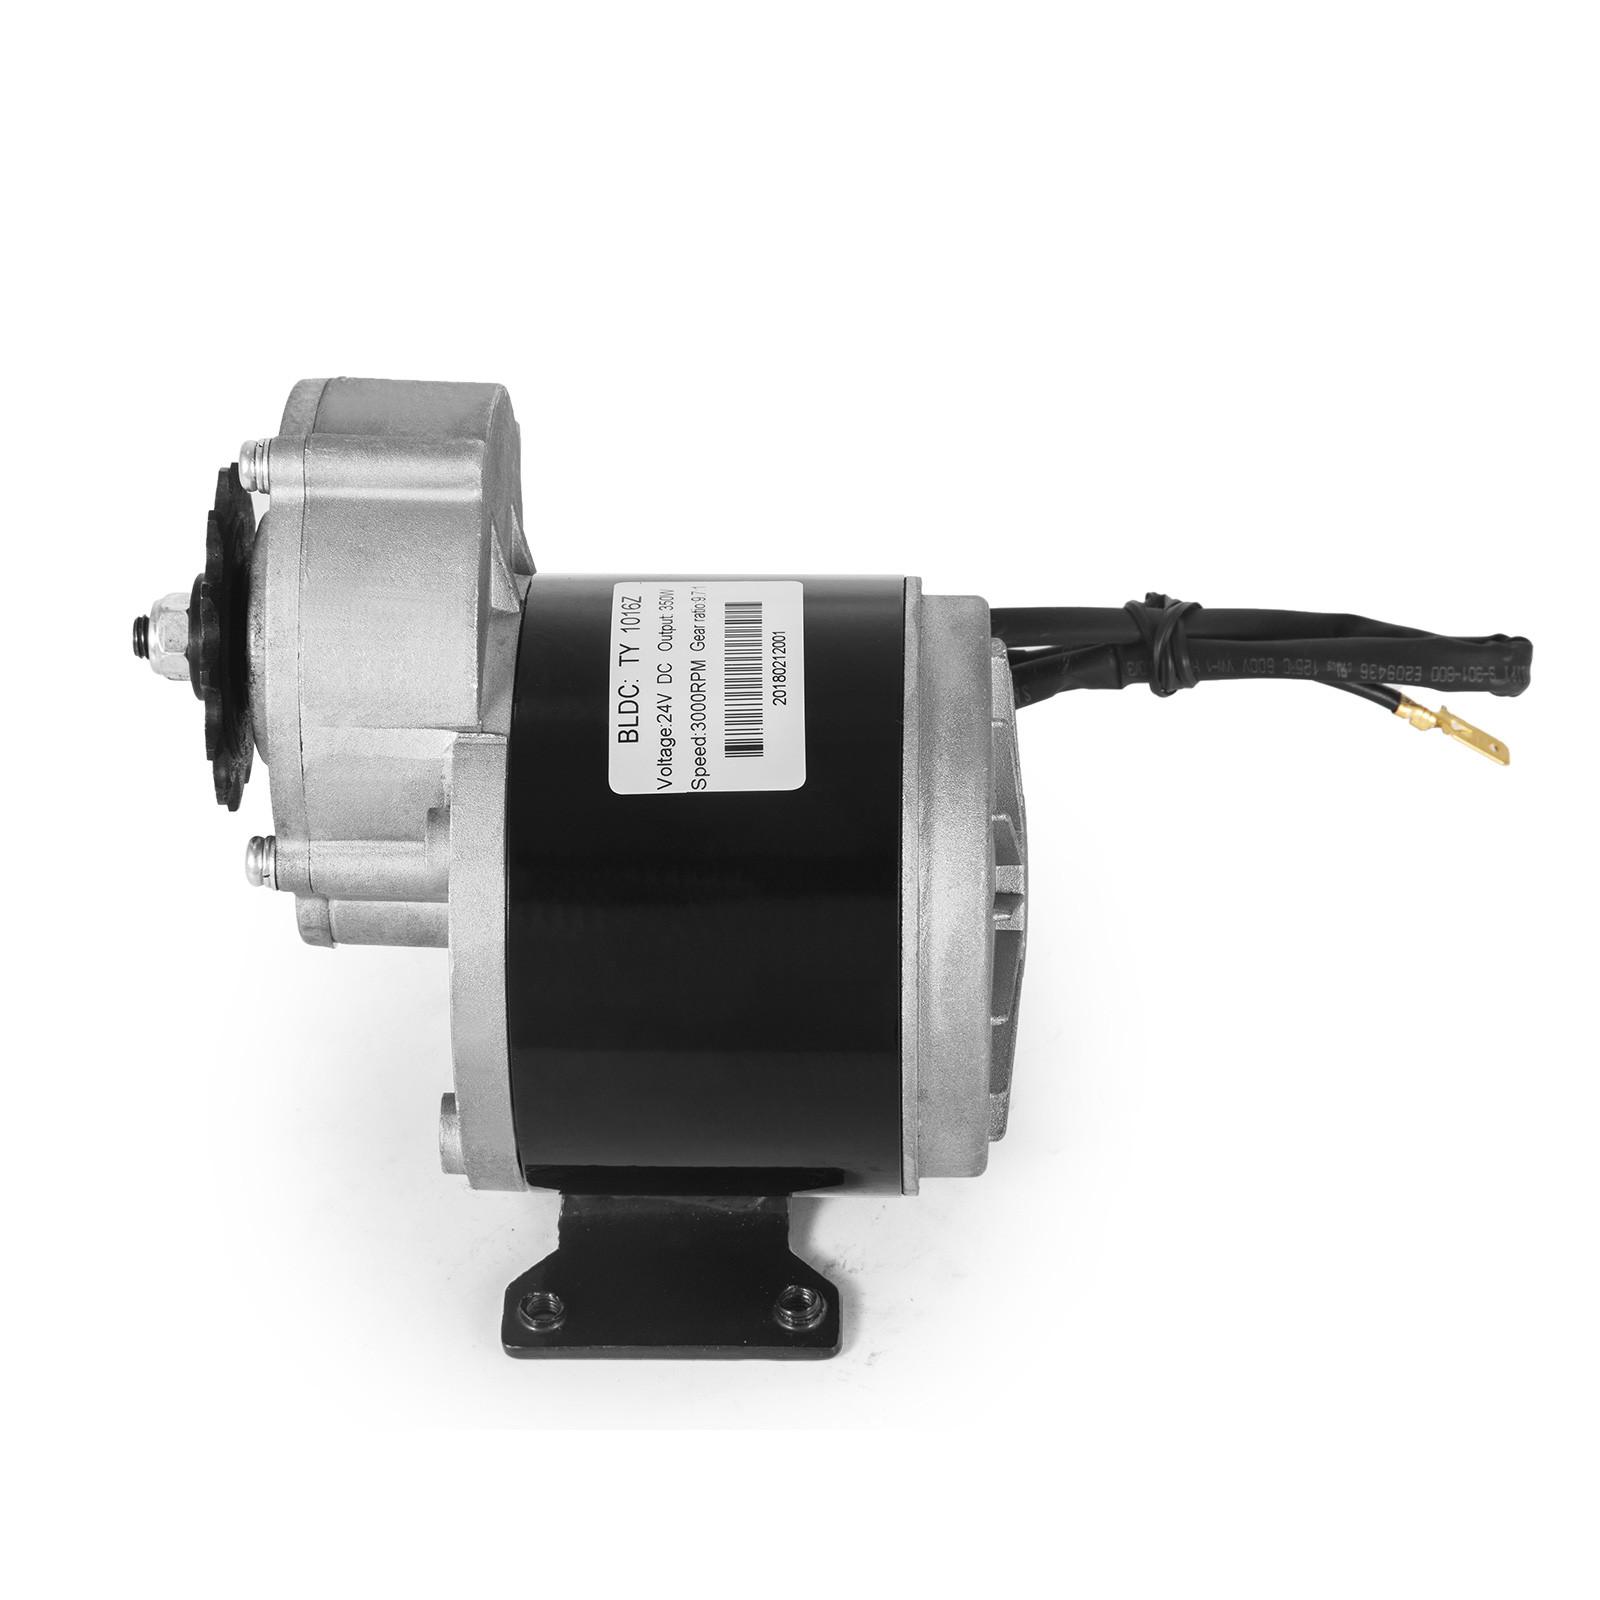 DC-electric-motor-12-60V-150W-2KW-for-scooter-bike-go-kart-minibike-e-ATV thumbnail 54